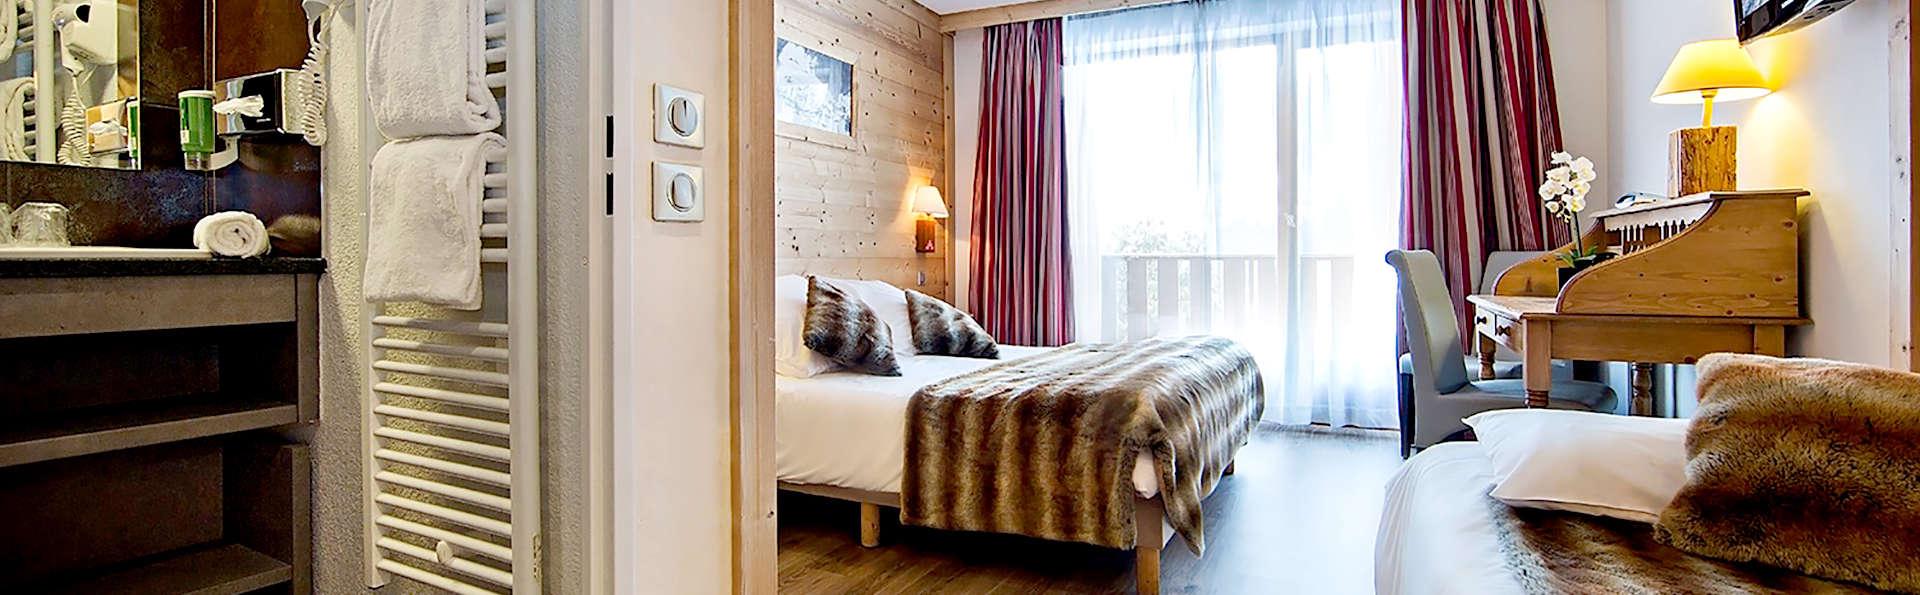 h tel alpen roc la clusaz 3 la clusaz france. Black Bedroom Furniture Sets. Home Design Ideas